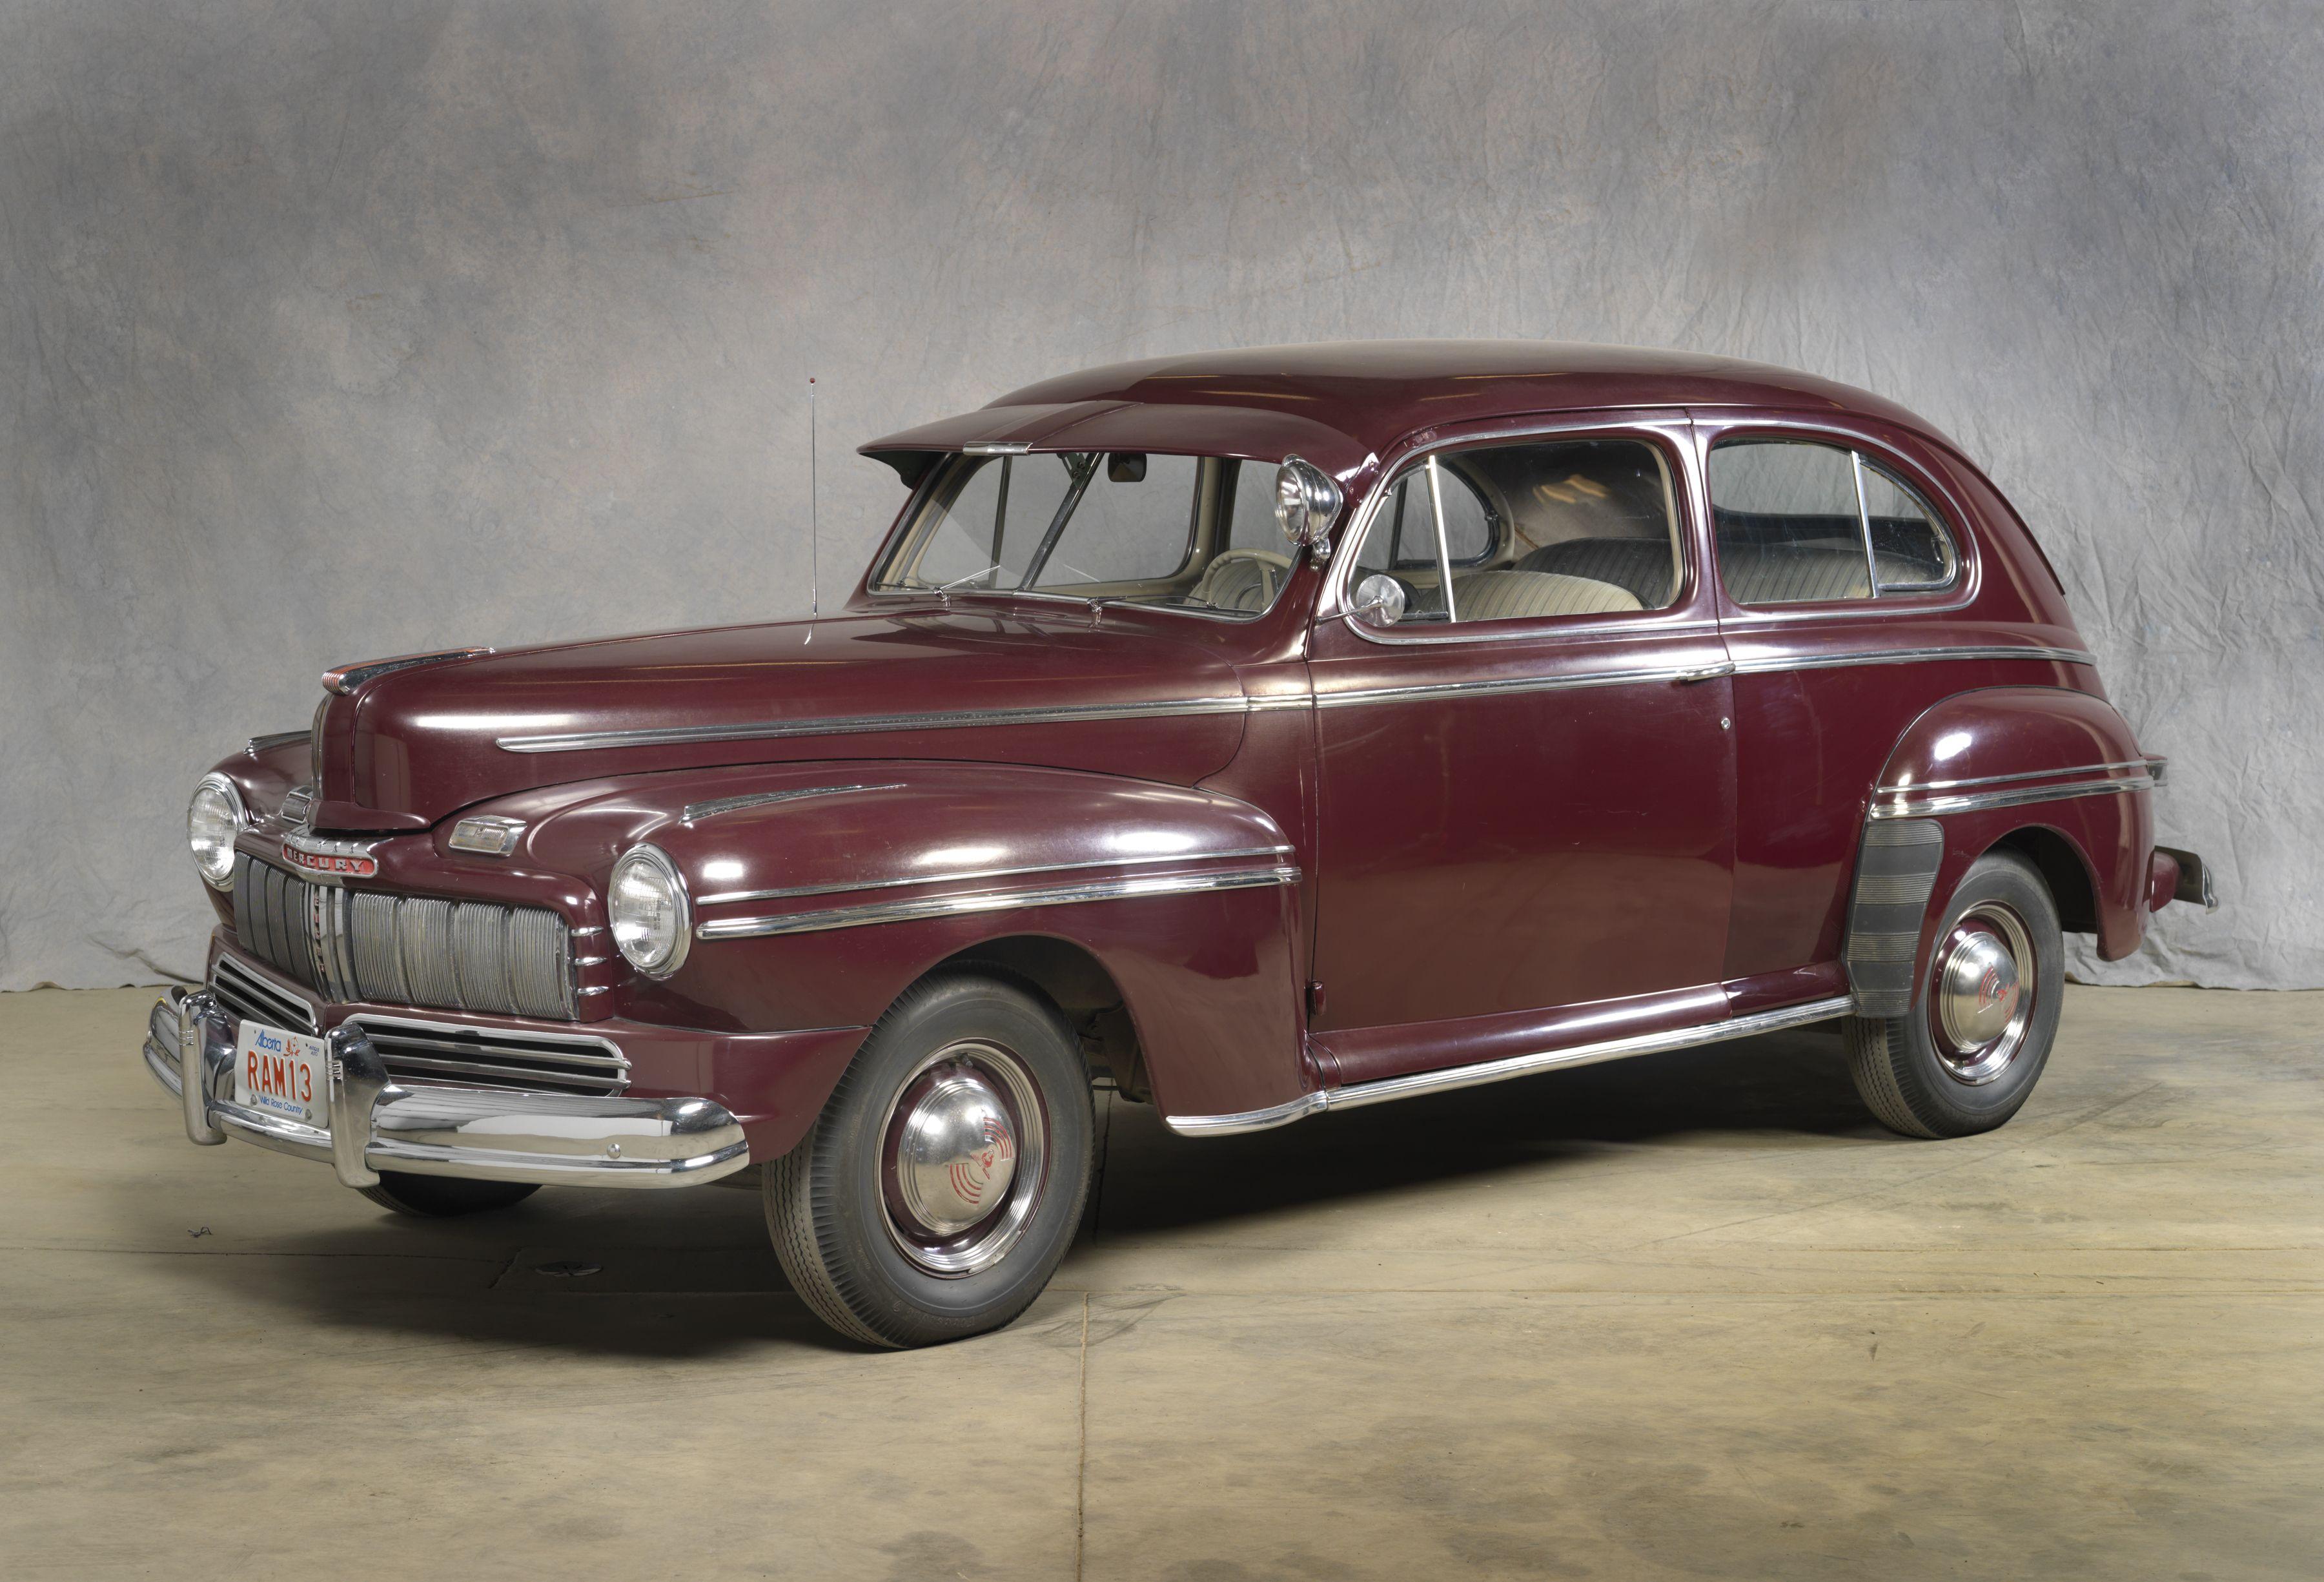 1946 mercury series 118 tudor sedan the mercury marque for Garage volvo gap